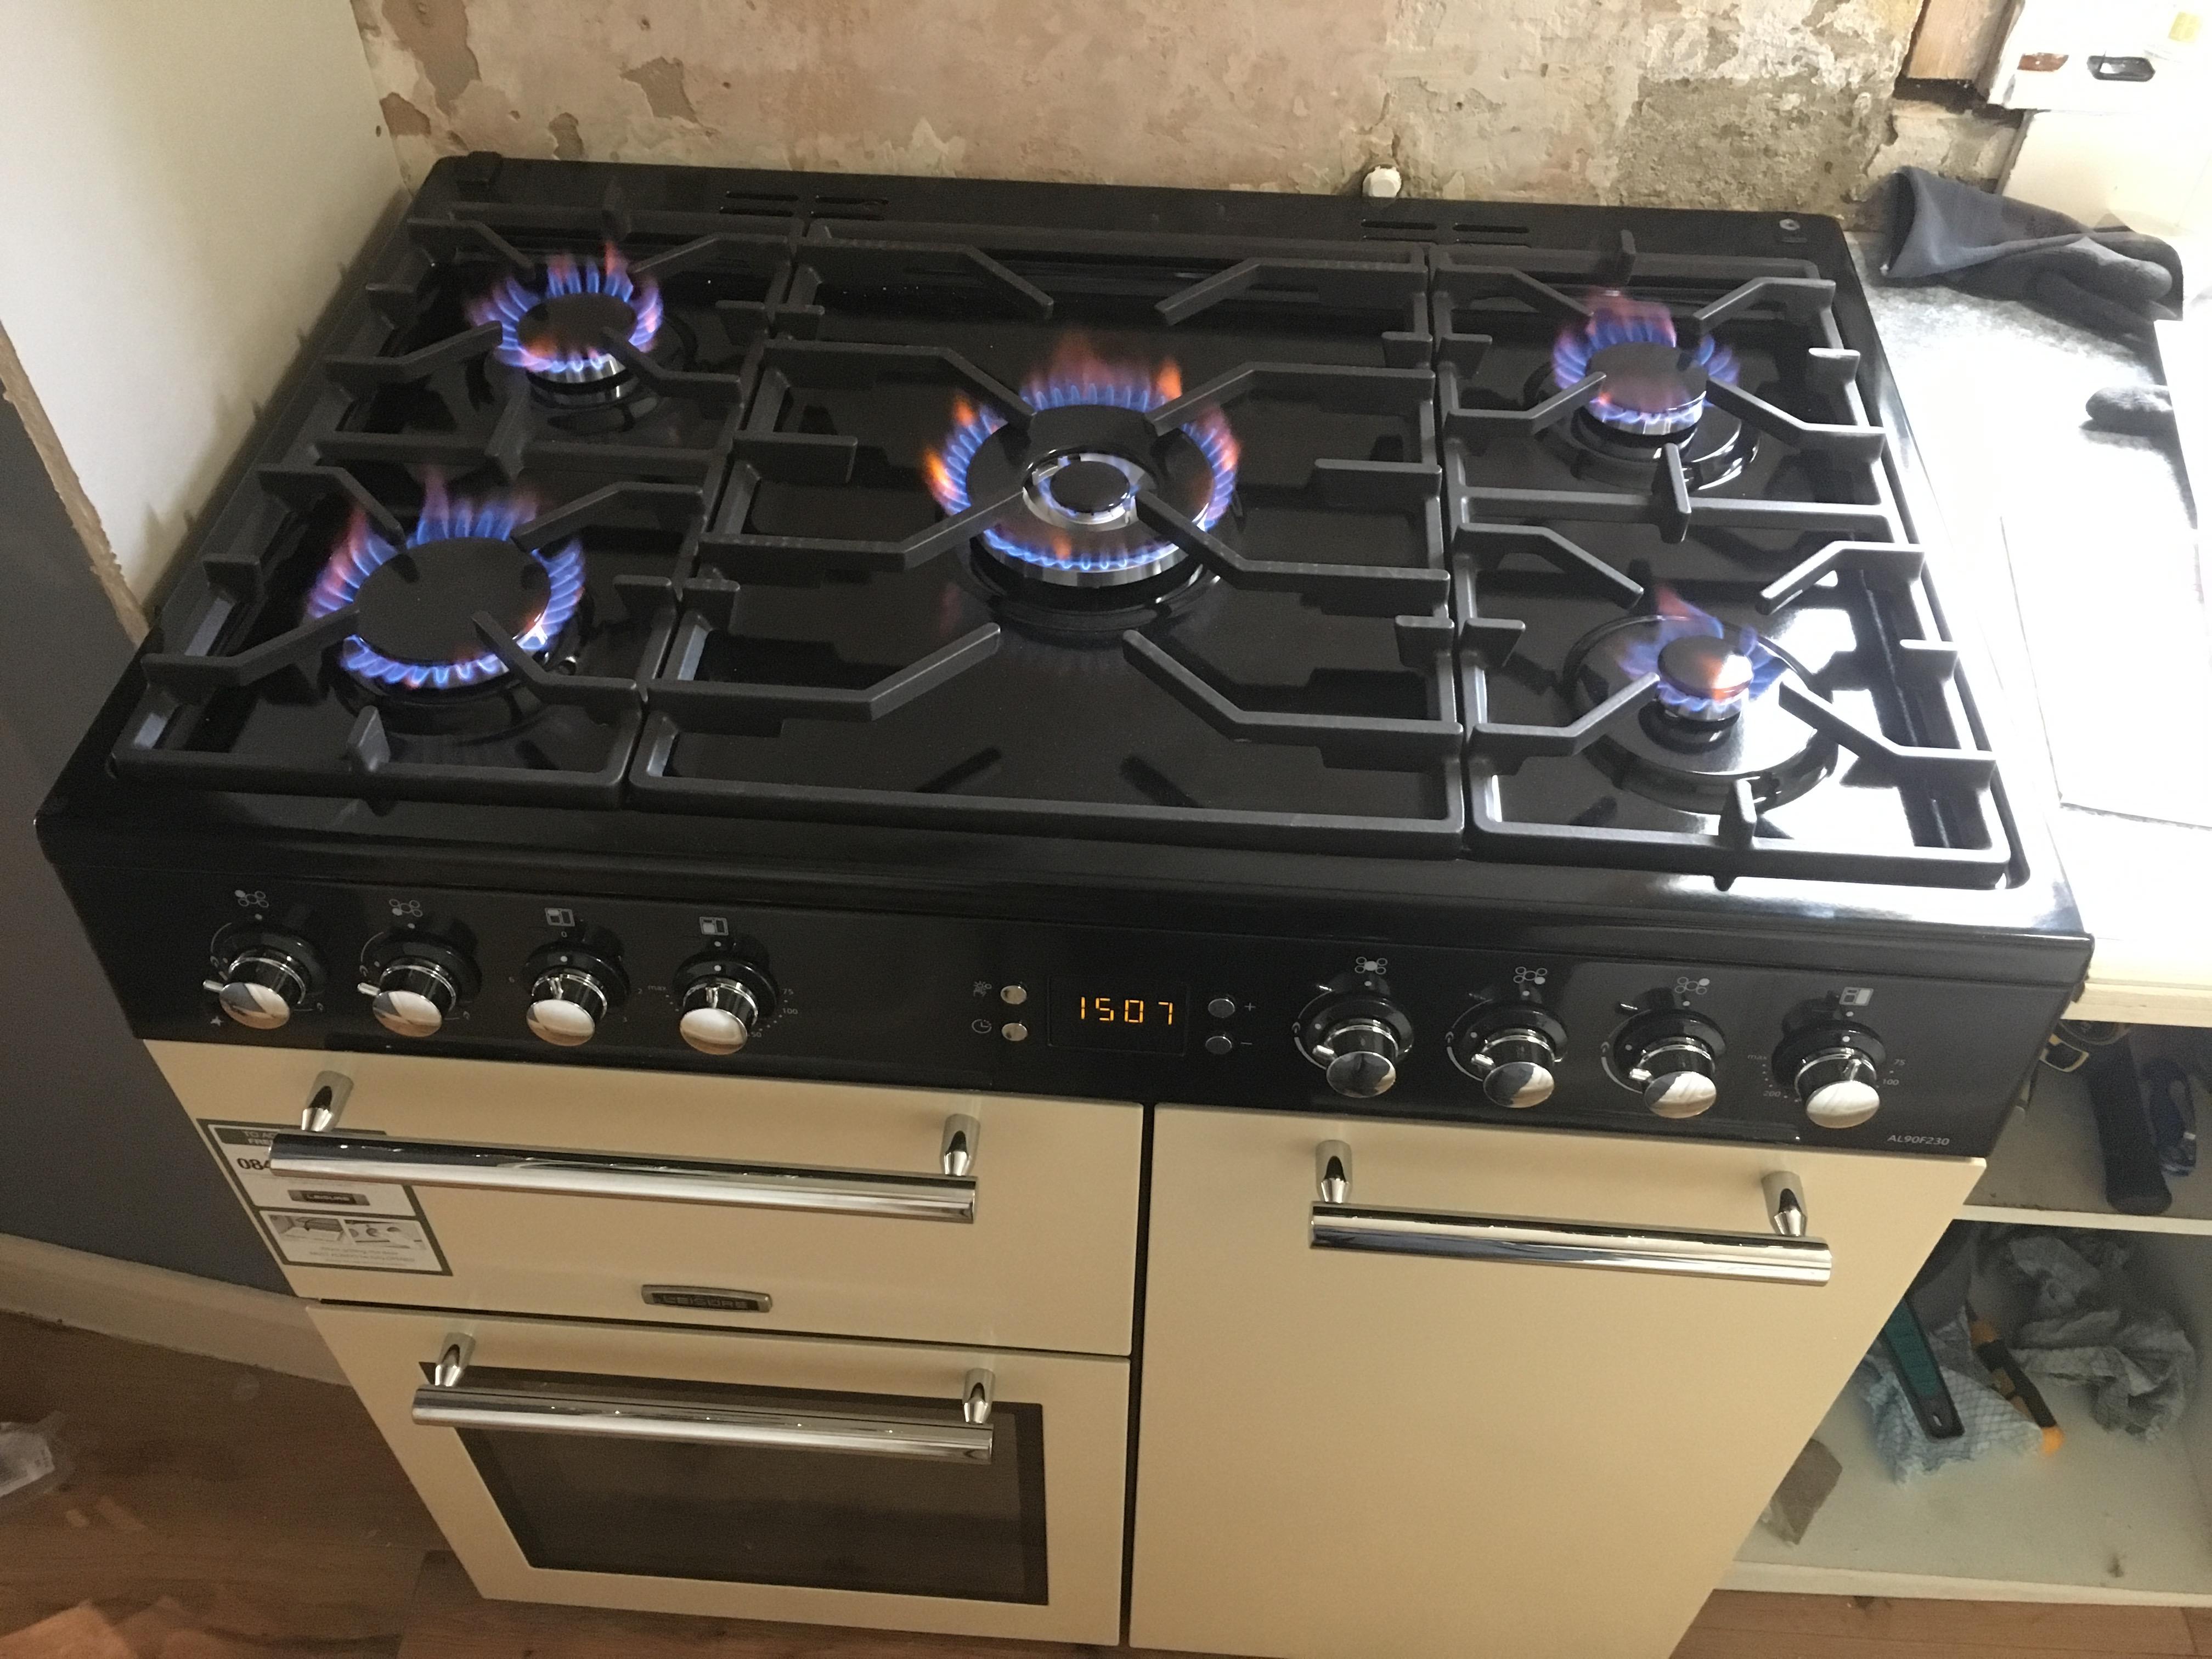 Installation of Range Cooker Leisure